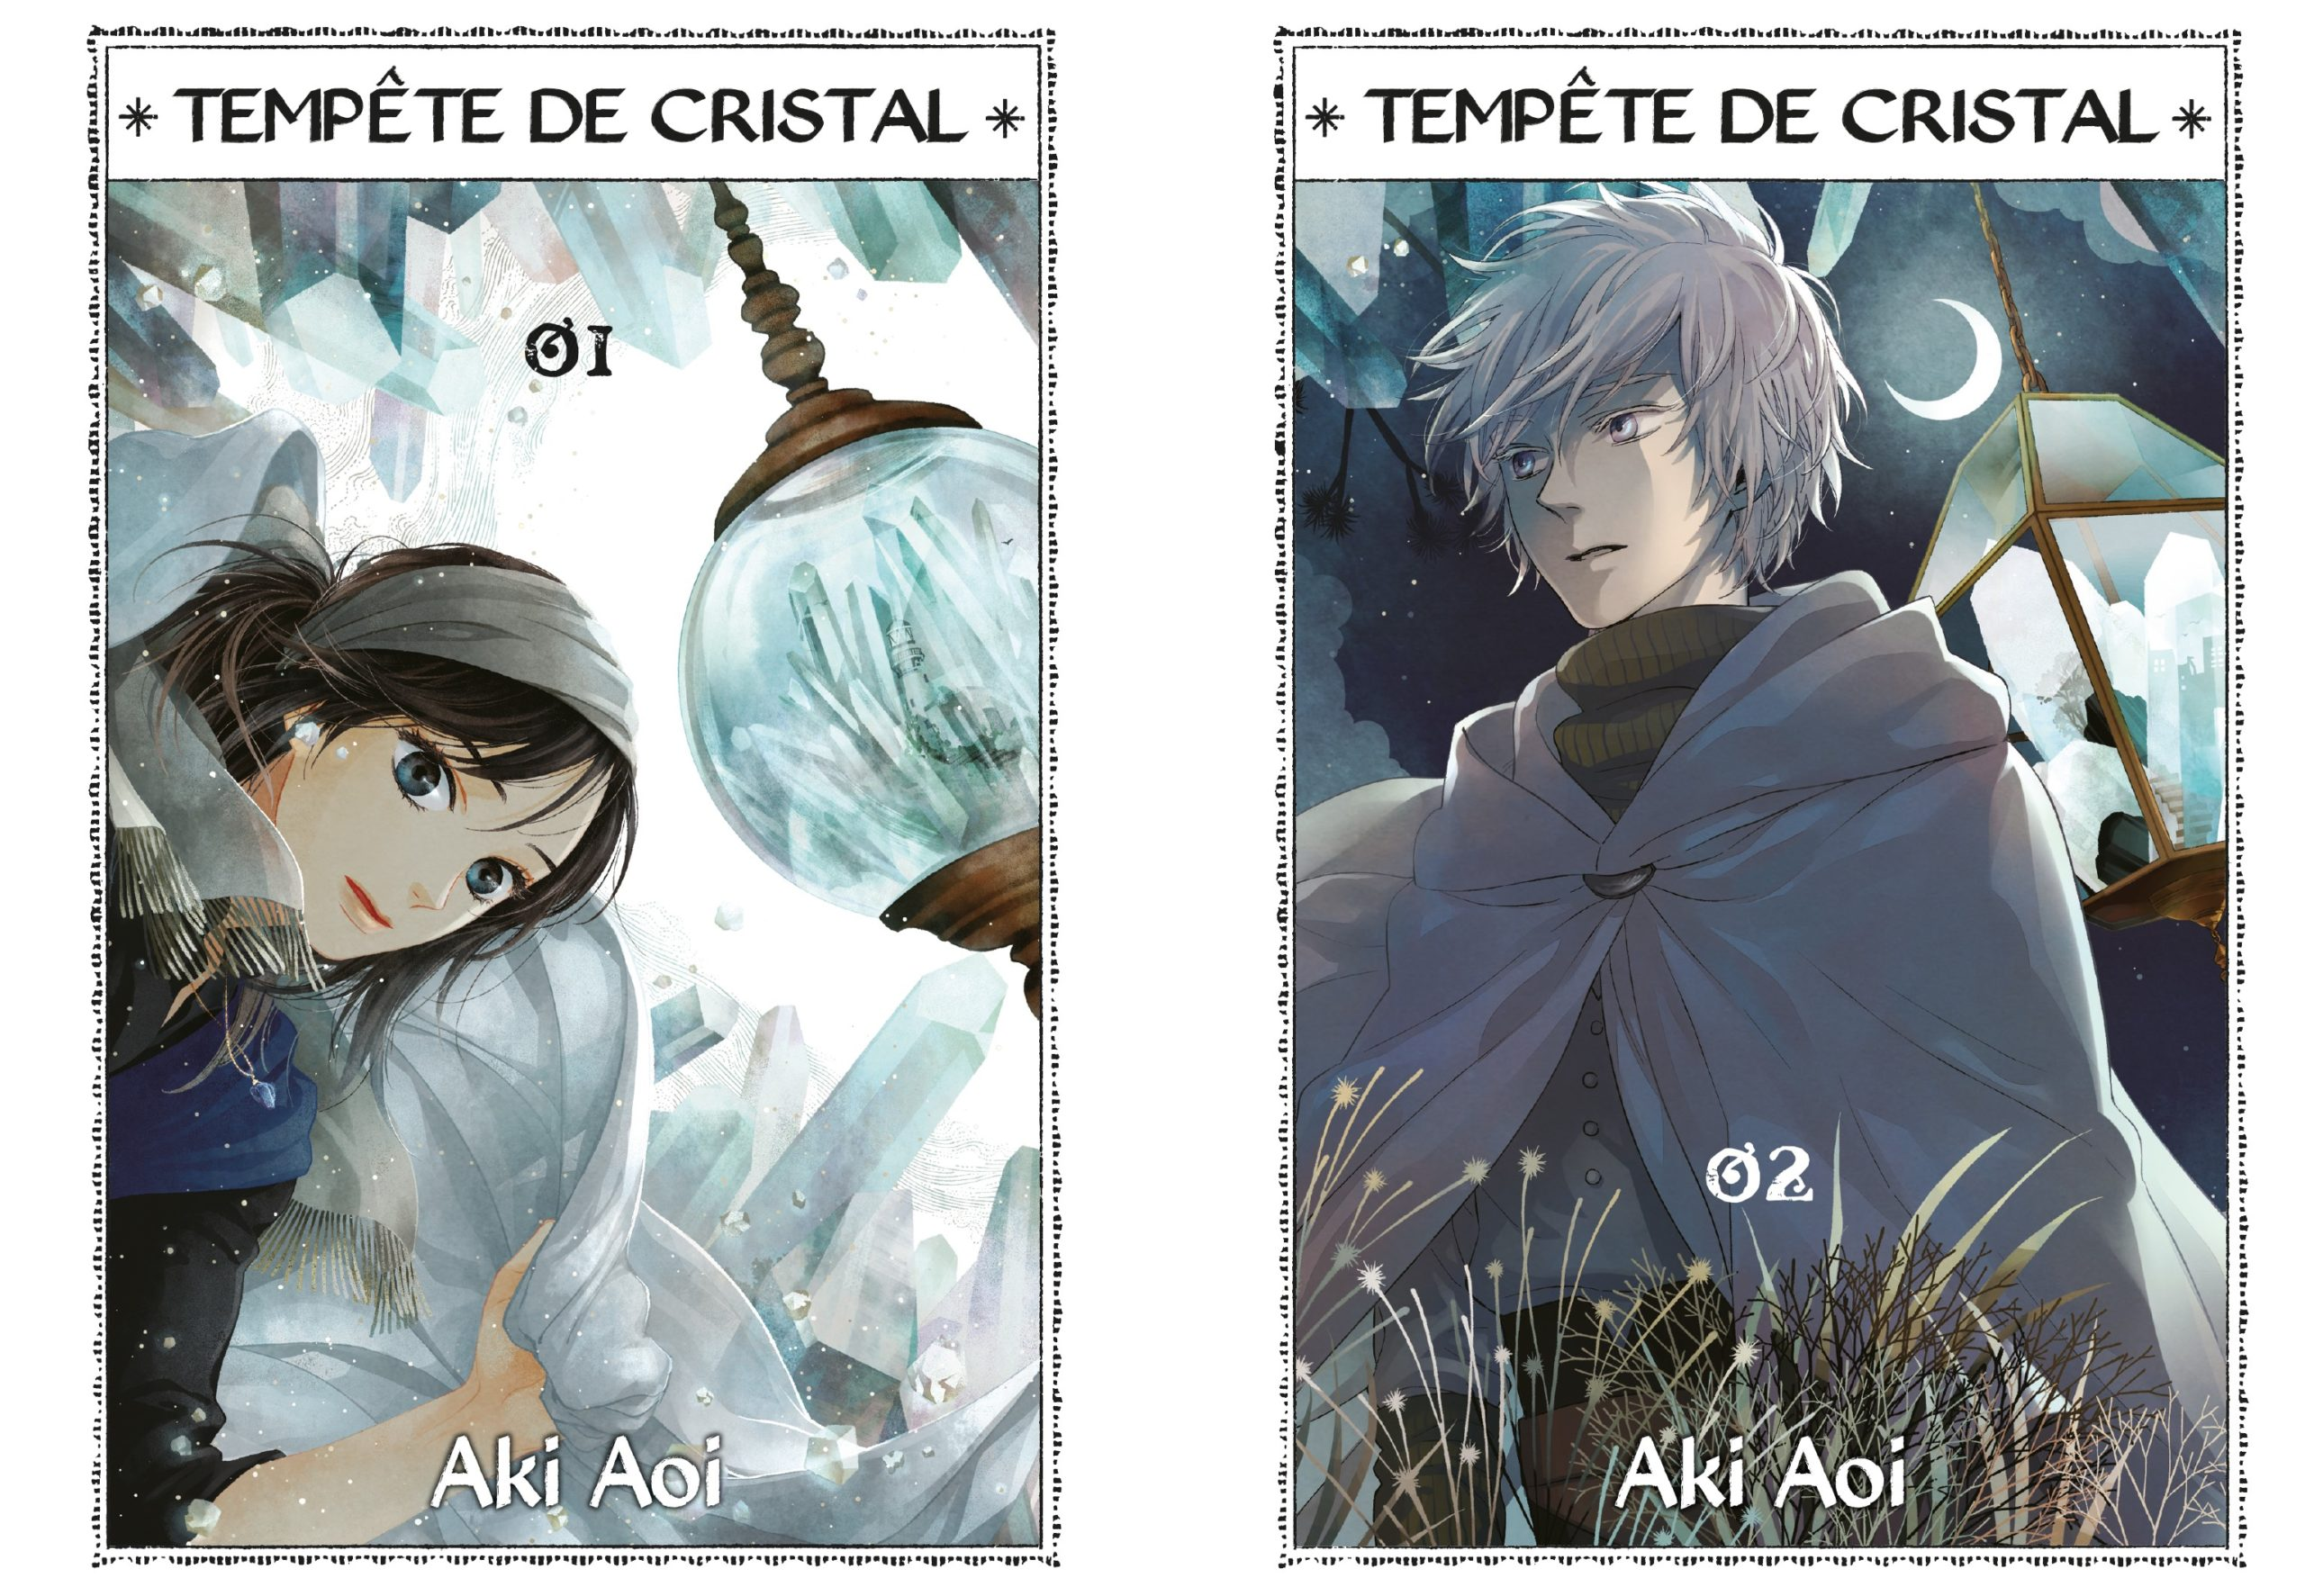 tempete-cristal